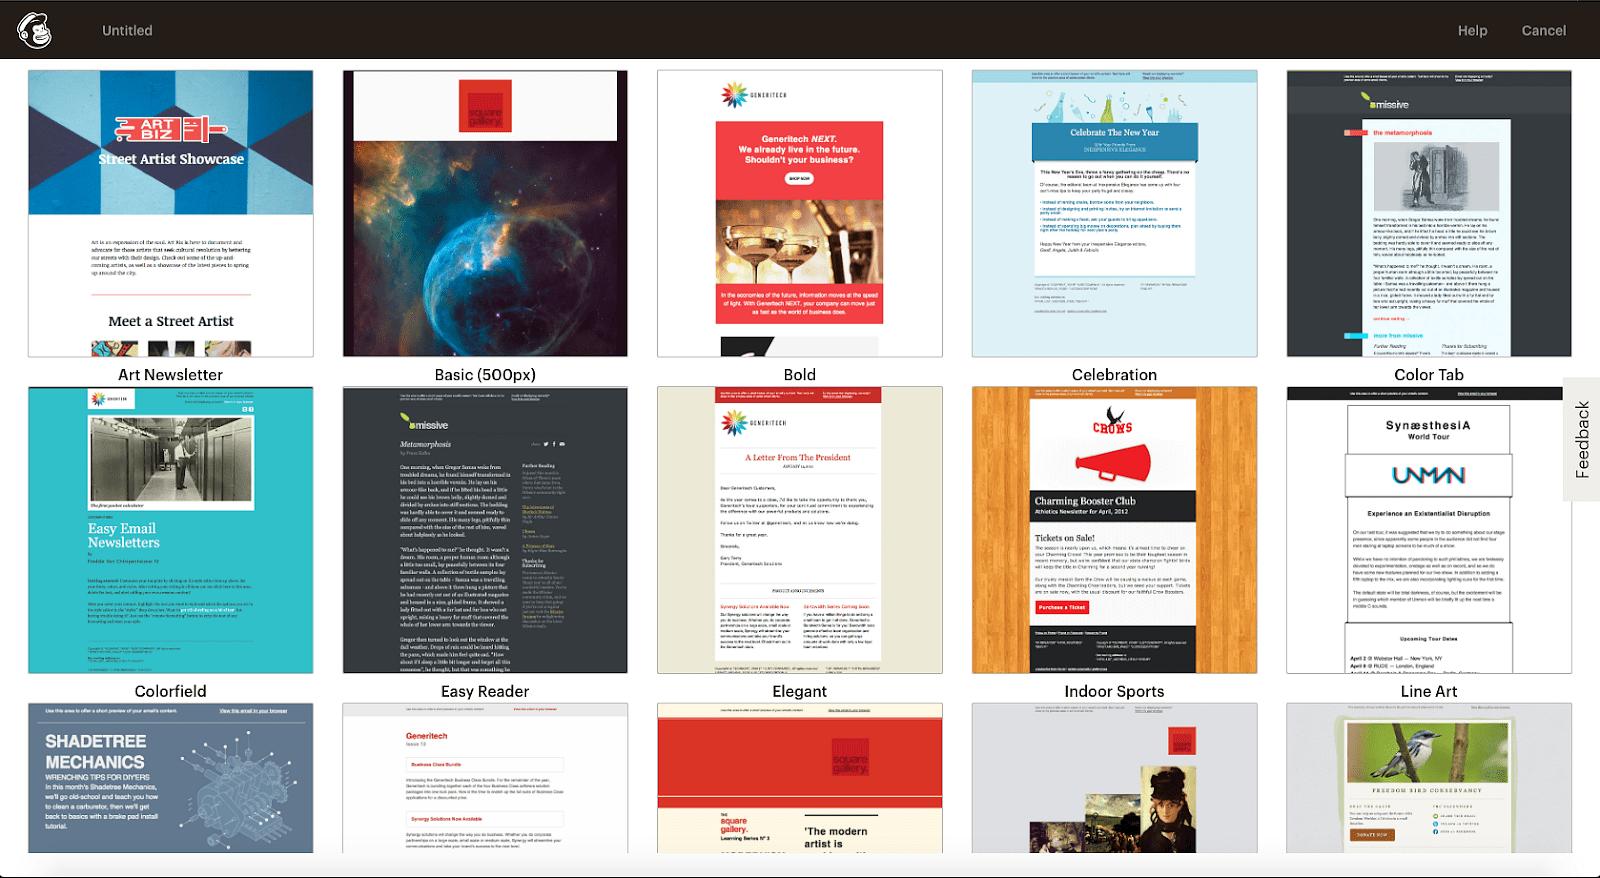 sendx-mailchimp-templates-library